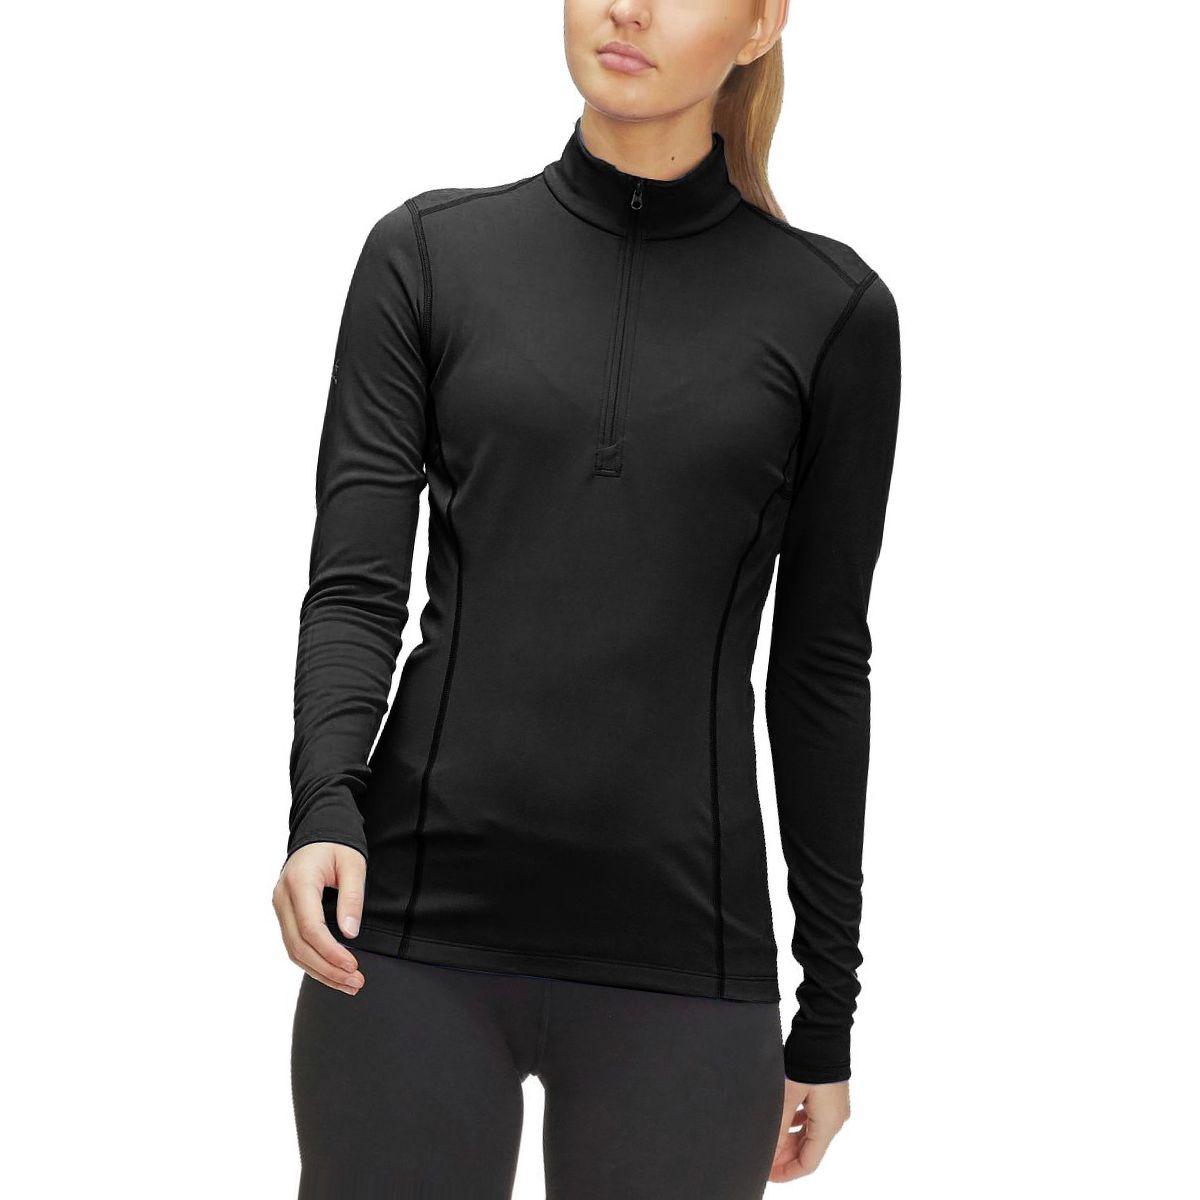 Arc'teryx Phase AR Zip-Neck Top - Women's